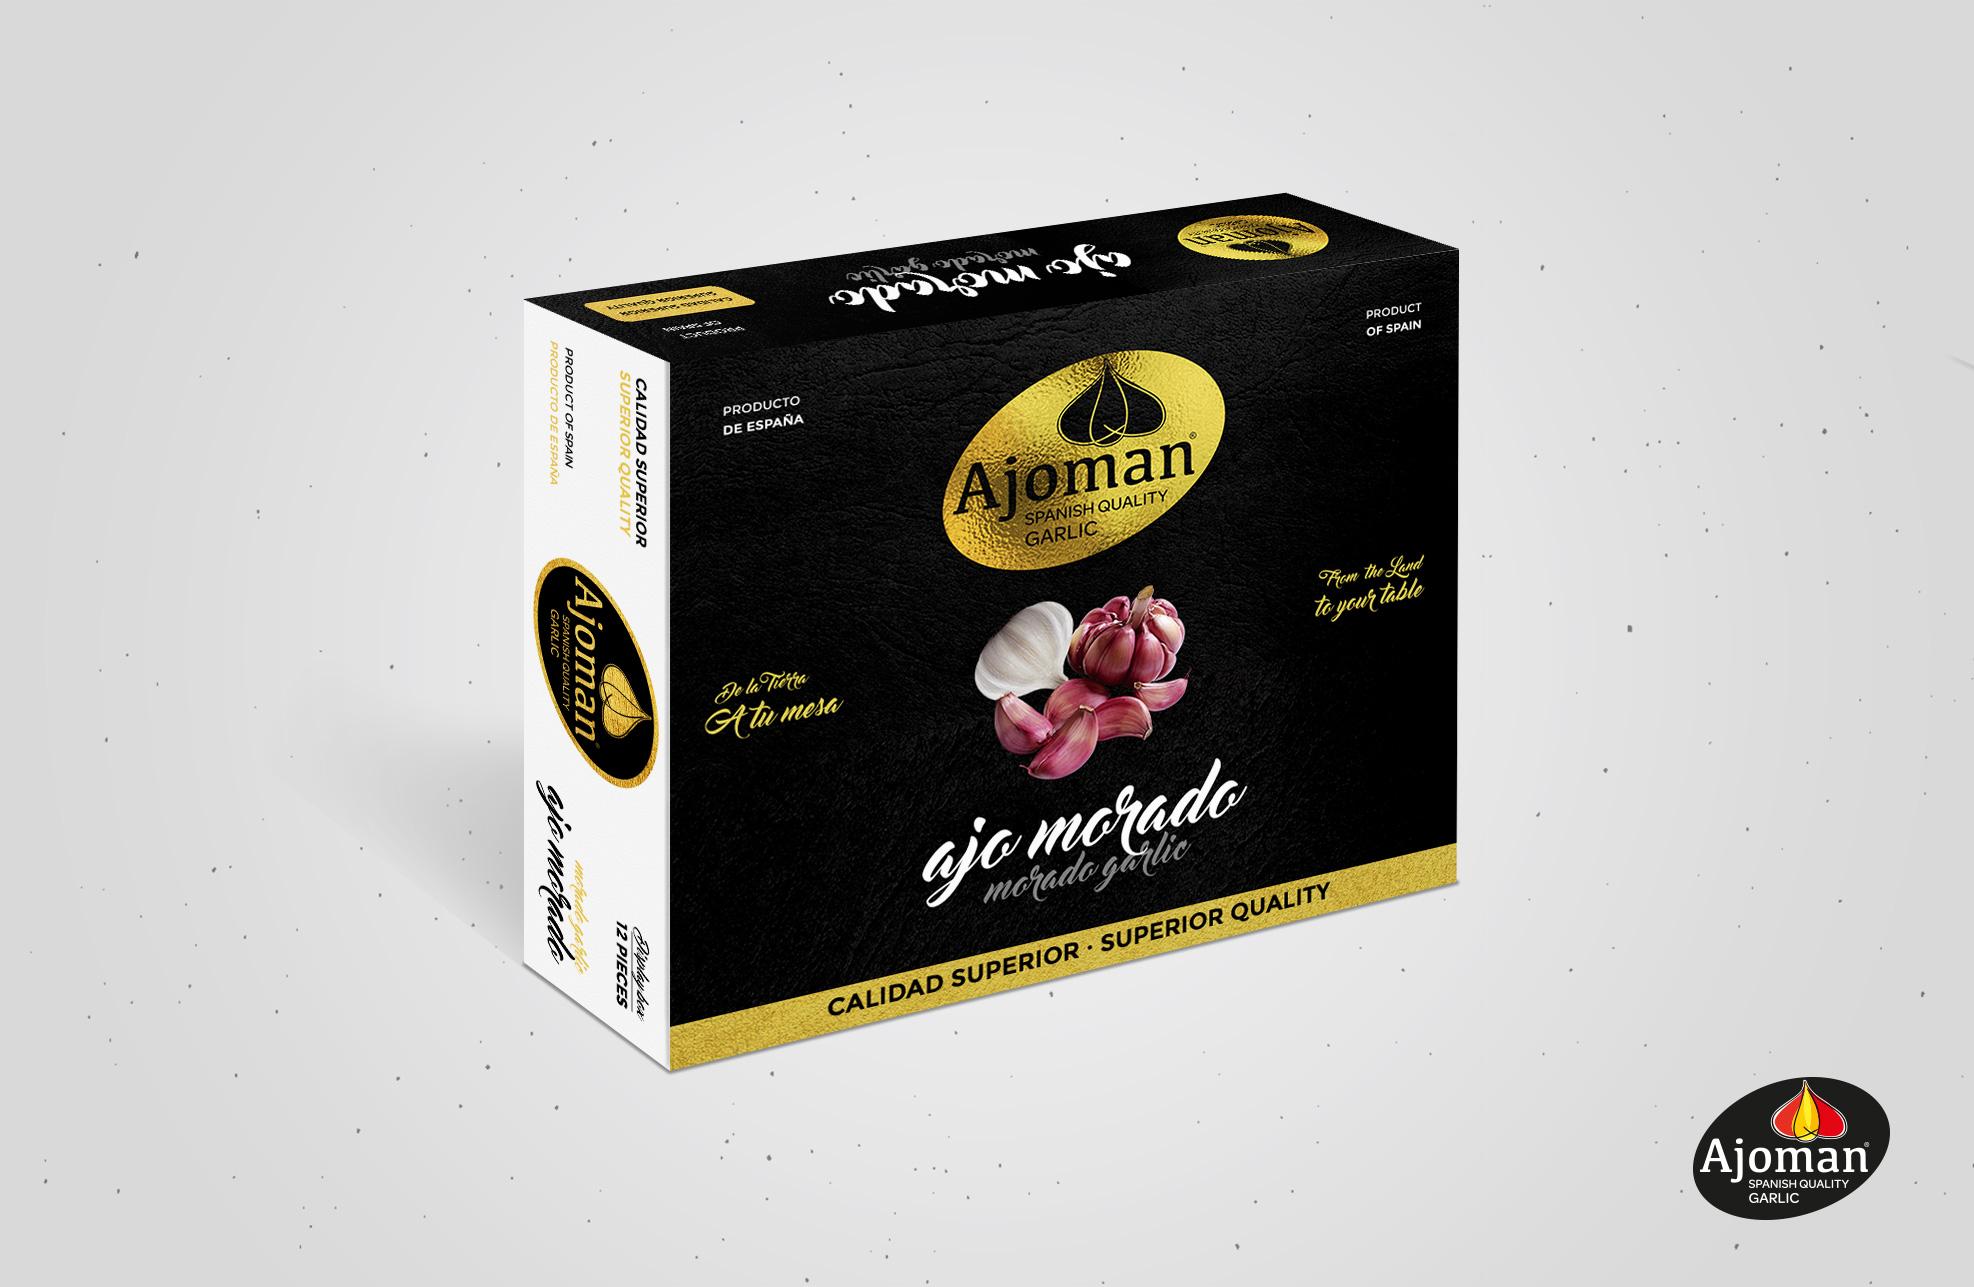 Diseño de packaging Albacete, diseño de imagen corporativa Ajoman, restyling marca, branding, diseño de packaging Ajoman.